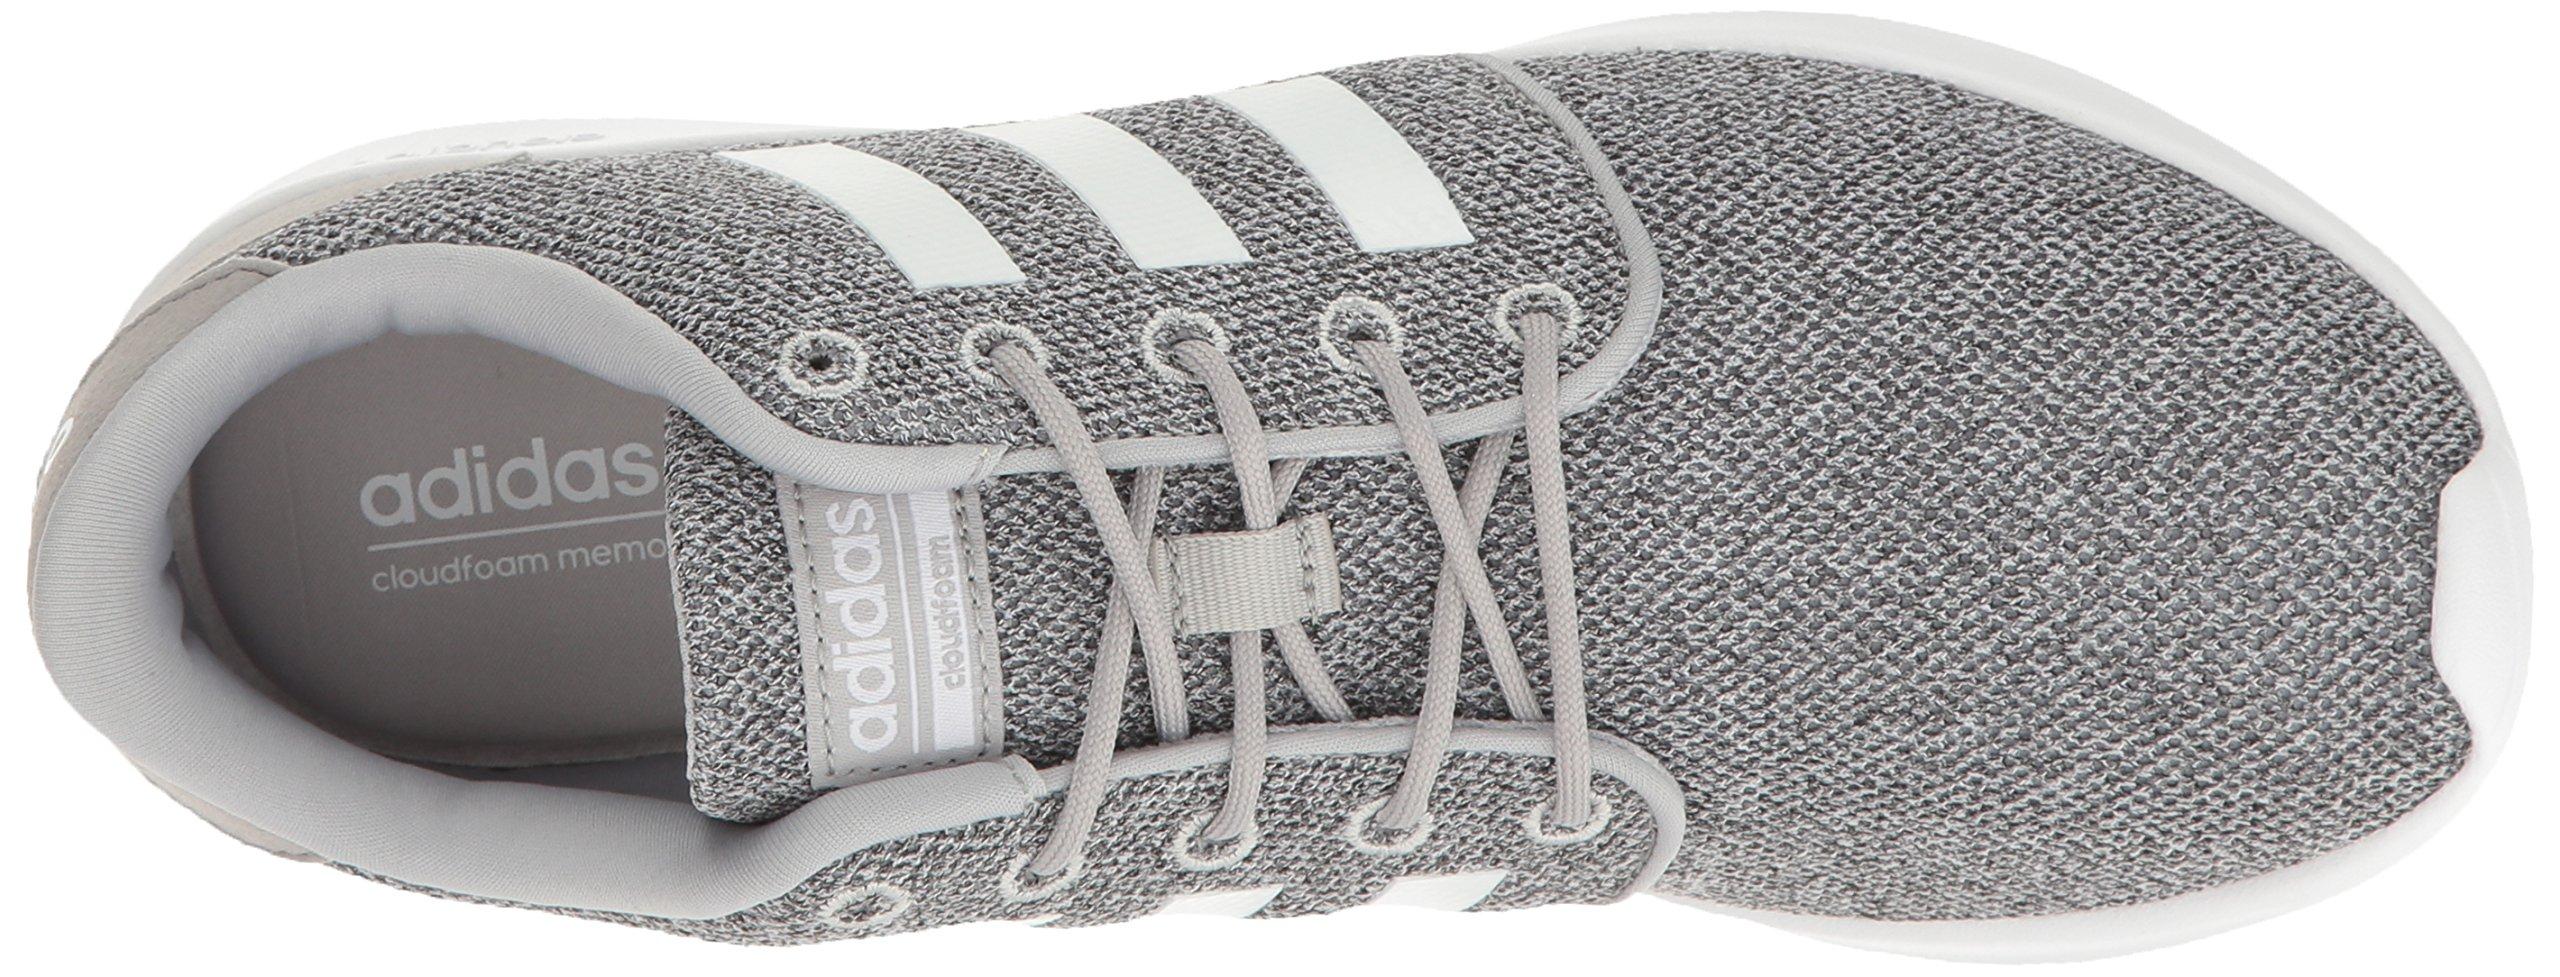 adidas Women's Cloudfoam Qt Racer w Running Shoe, Clear Onix/White/Light Onix, 5 M US by adidas (Image #8)